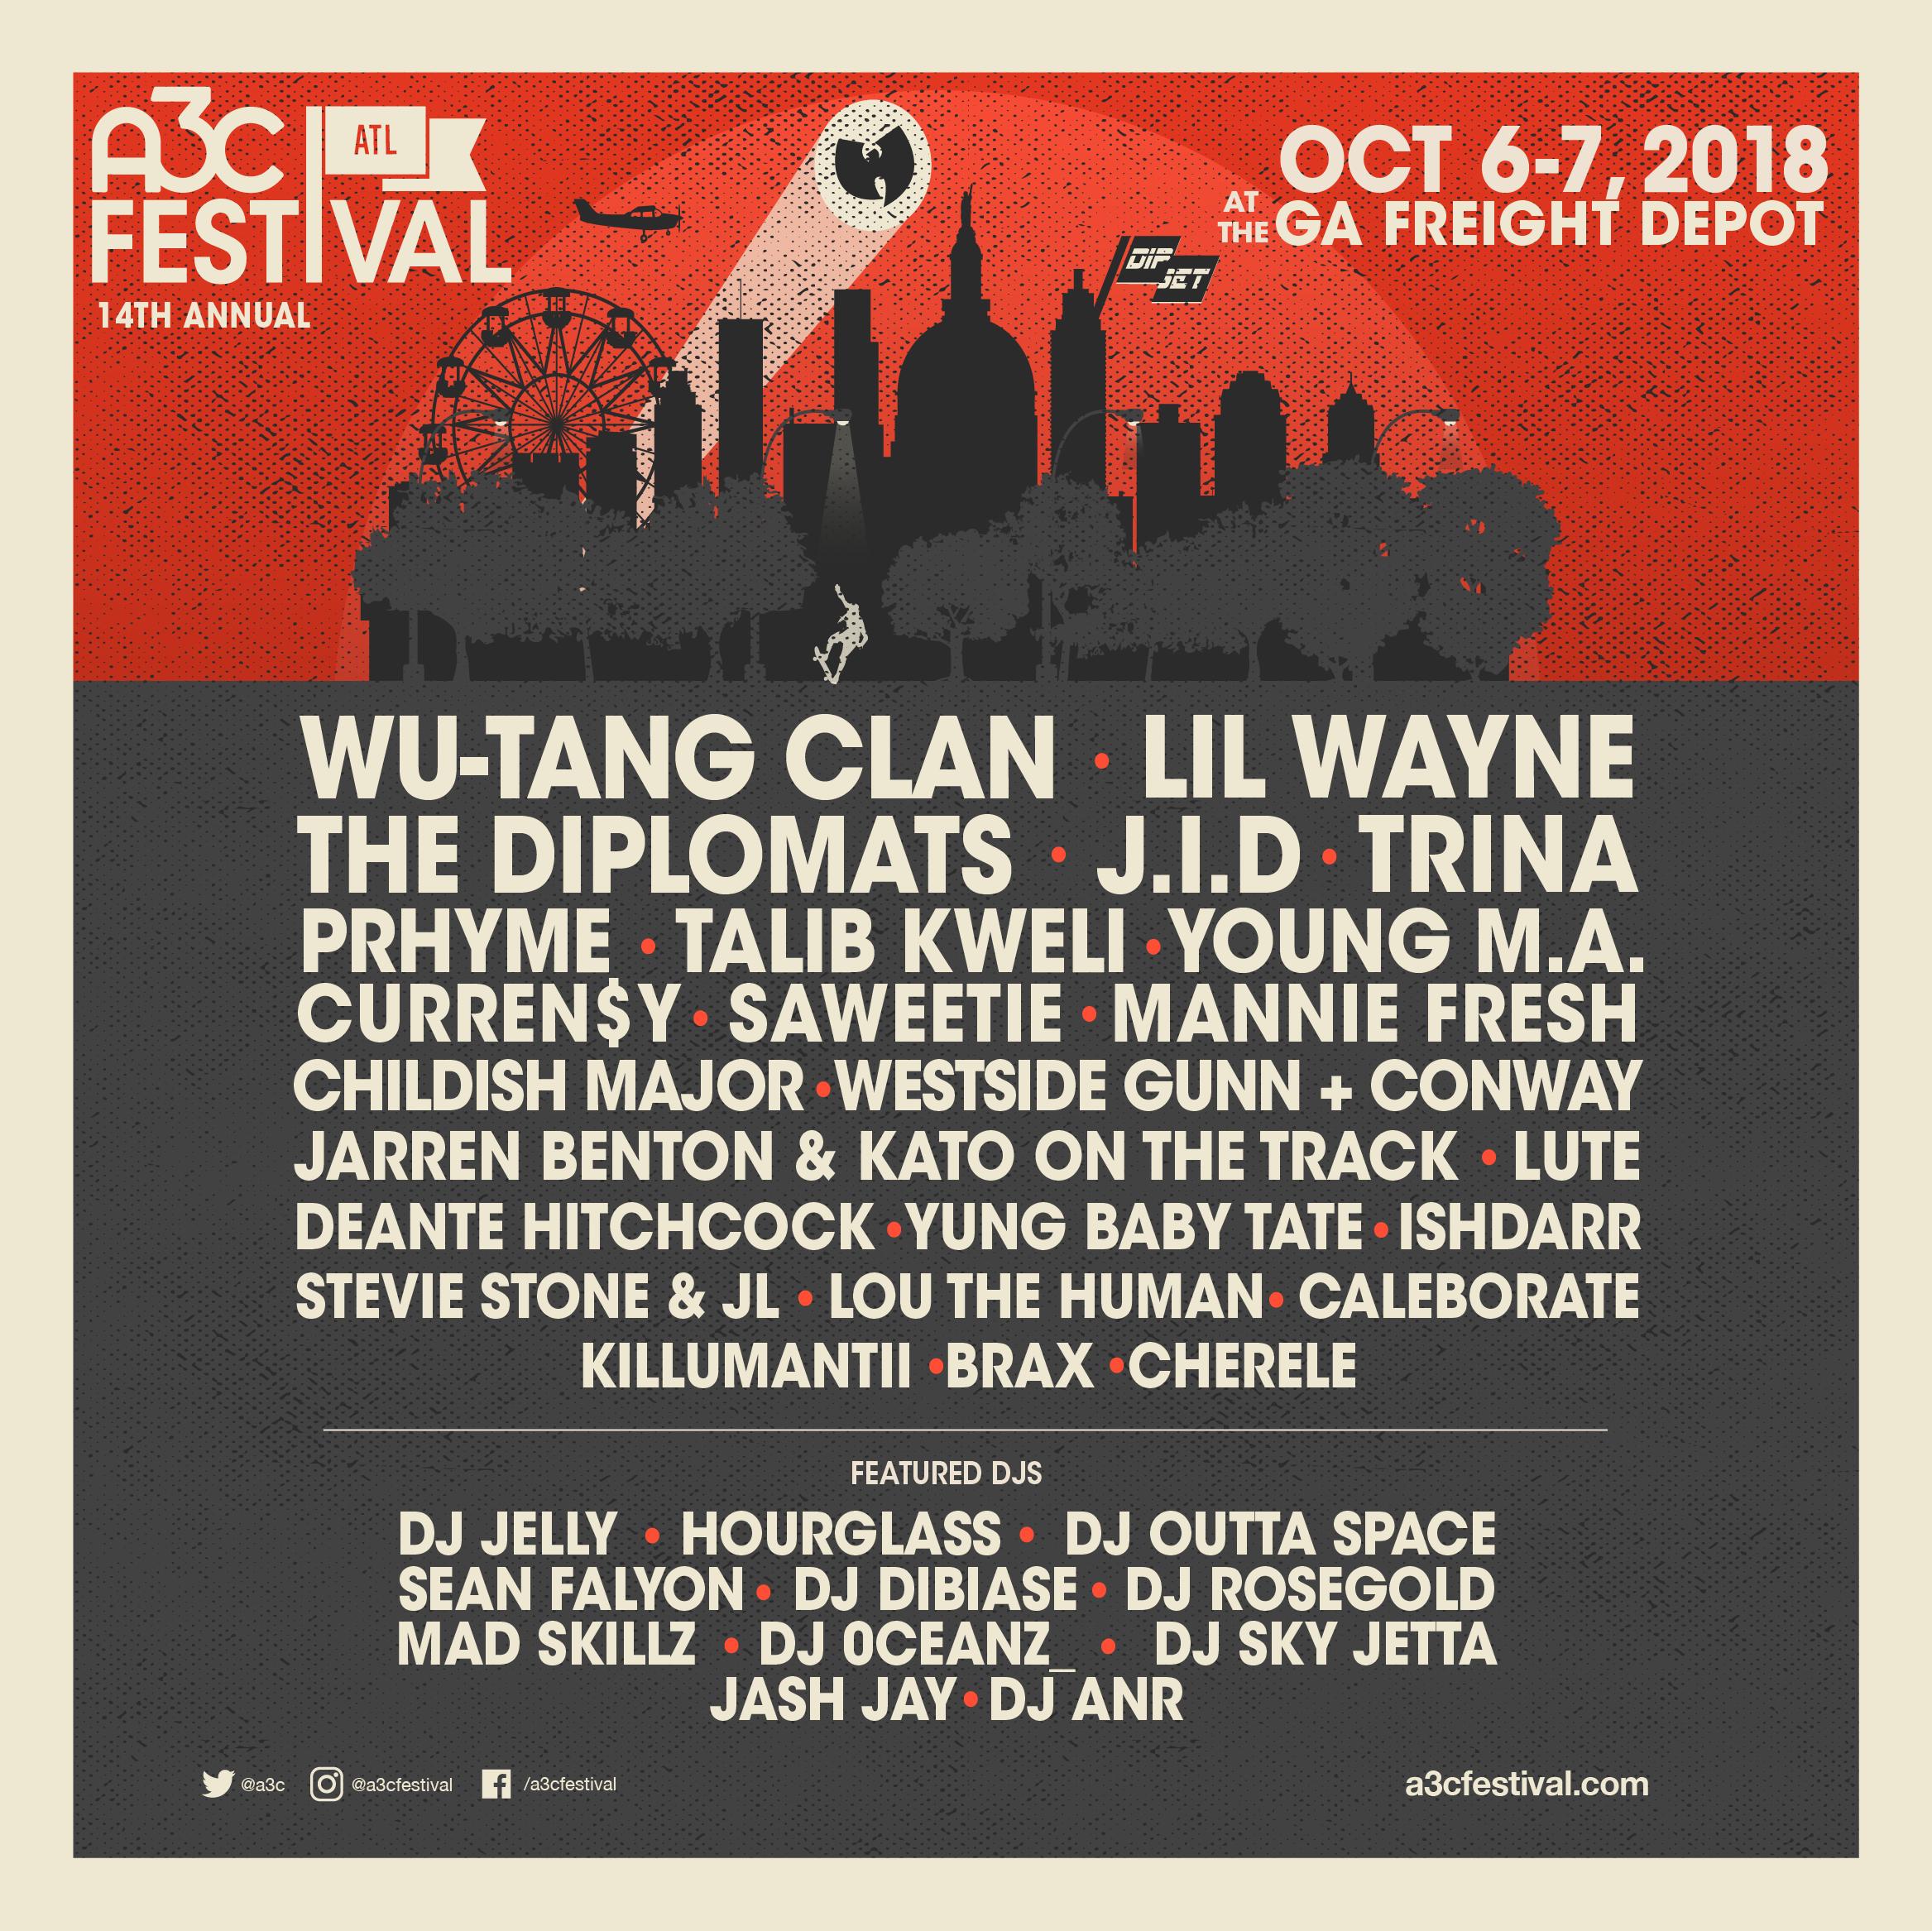 Festival Poster - A3C 2018 - FINAL IG